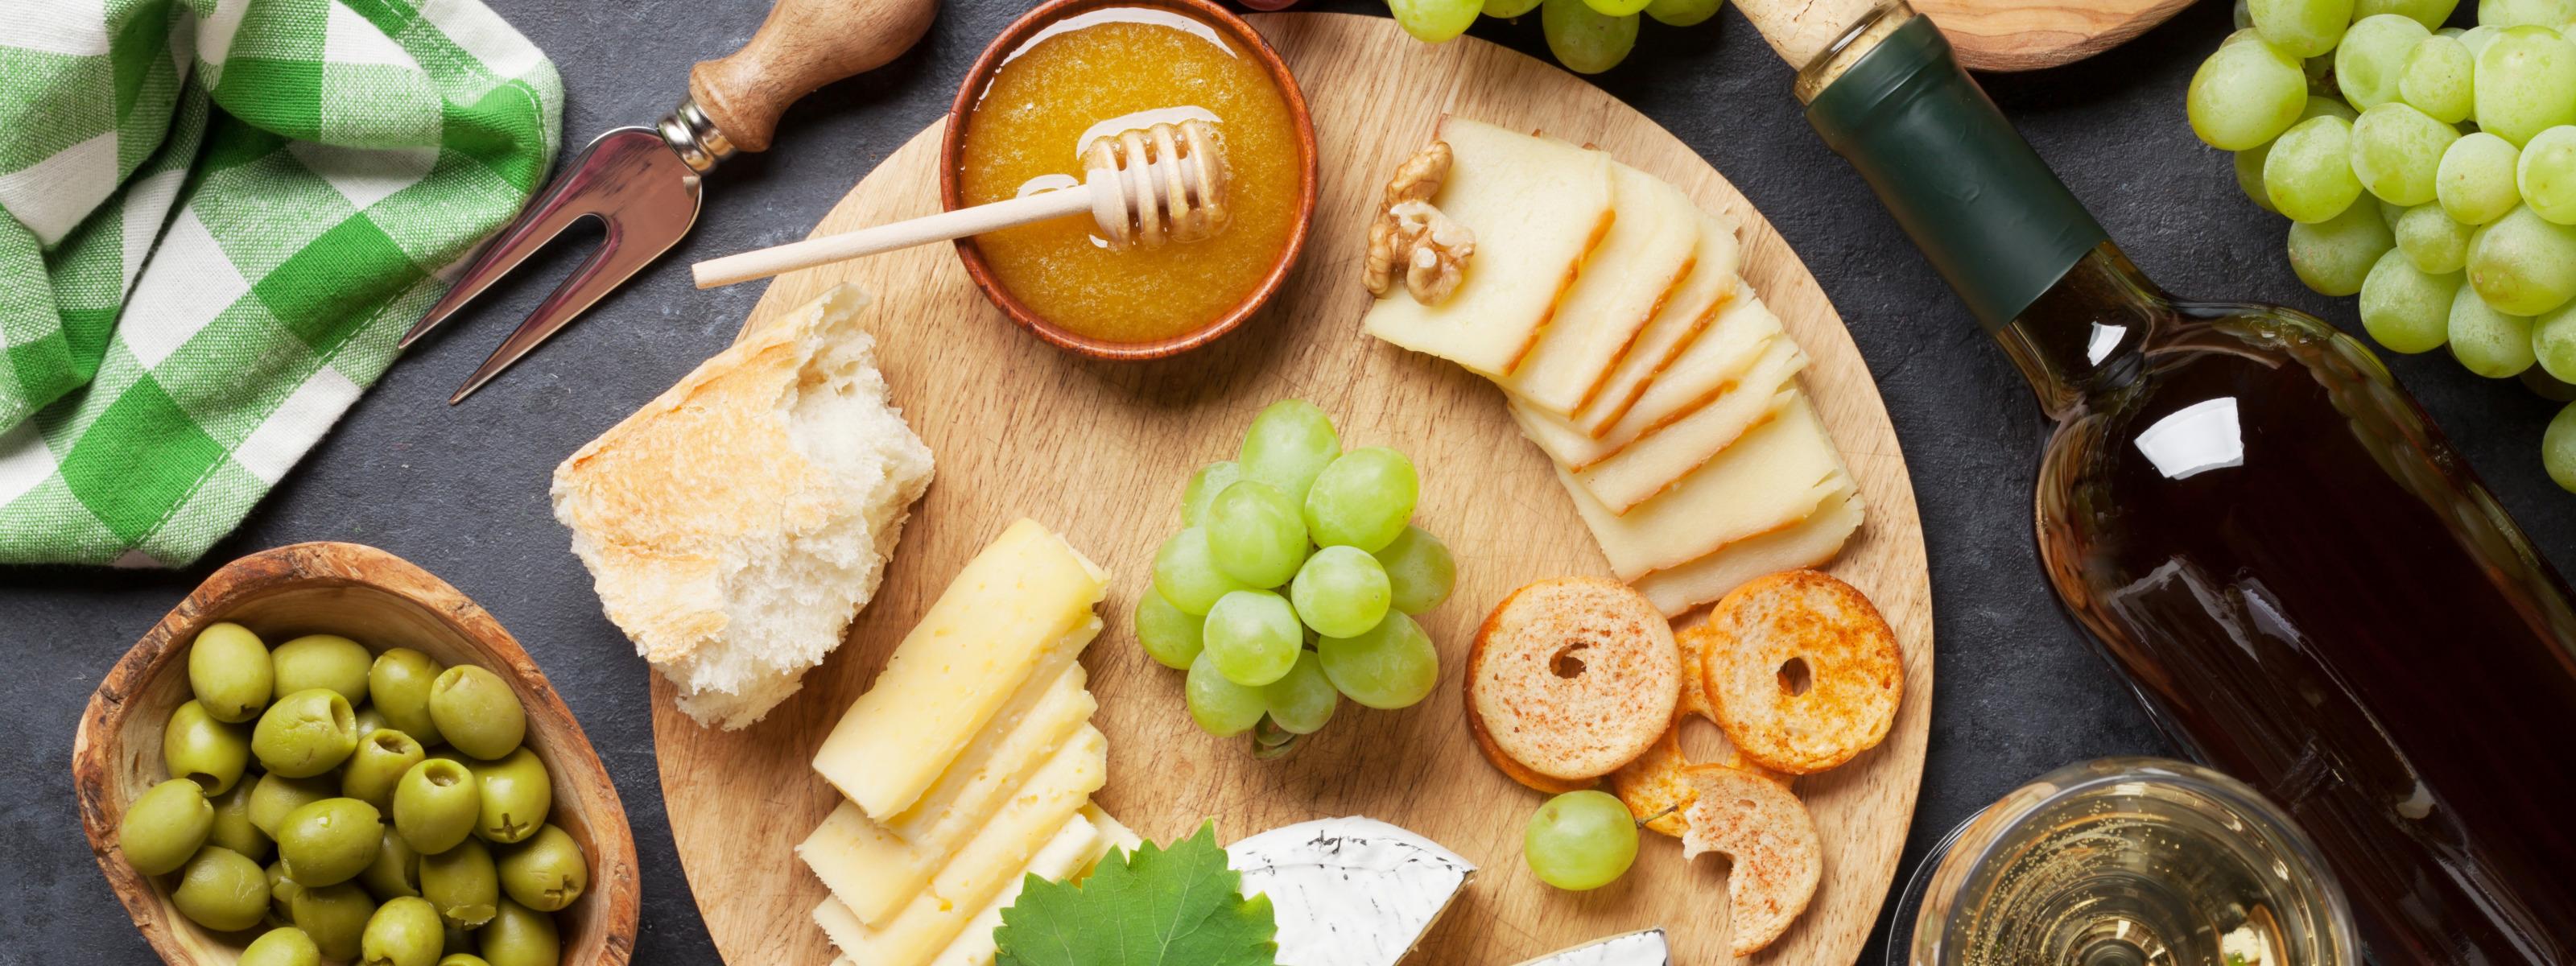 каждому нас сыр мед вино картинки скрипт